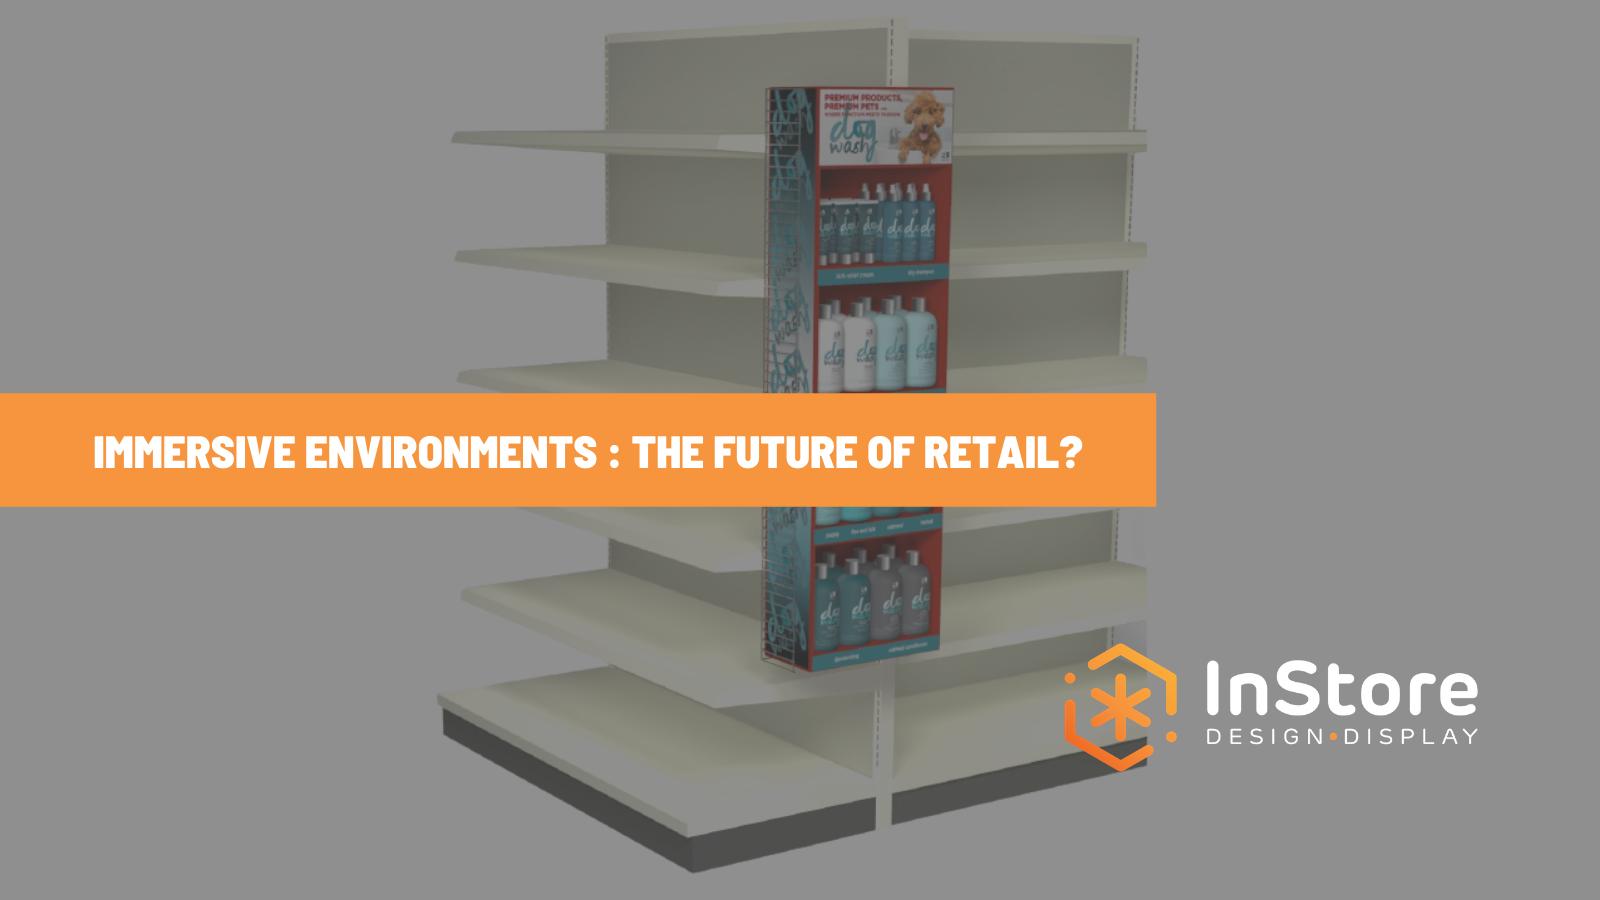 The Future of Brick and Mortar: Immersive Retail Environments